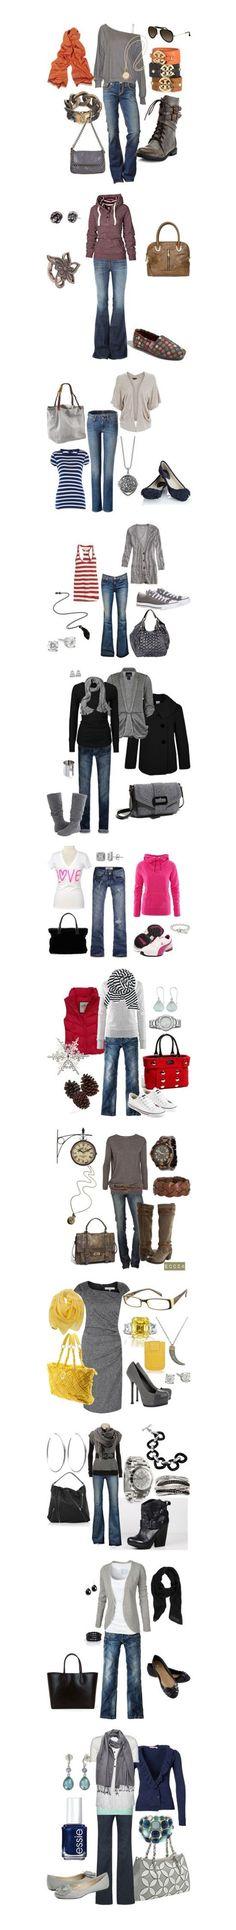 Casual Winter Fashion Trends